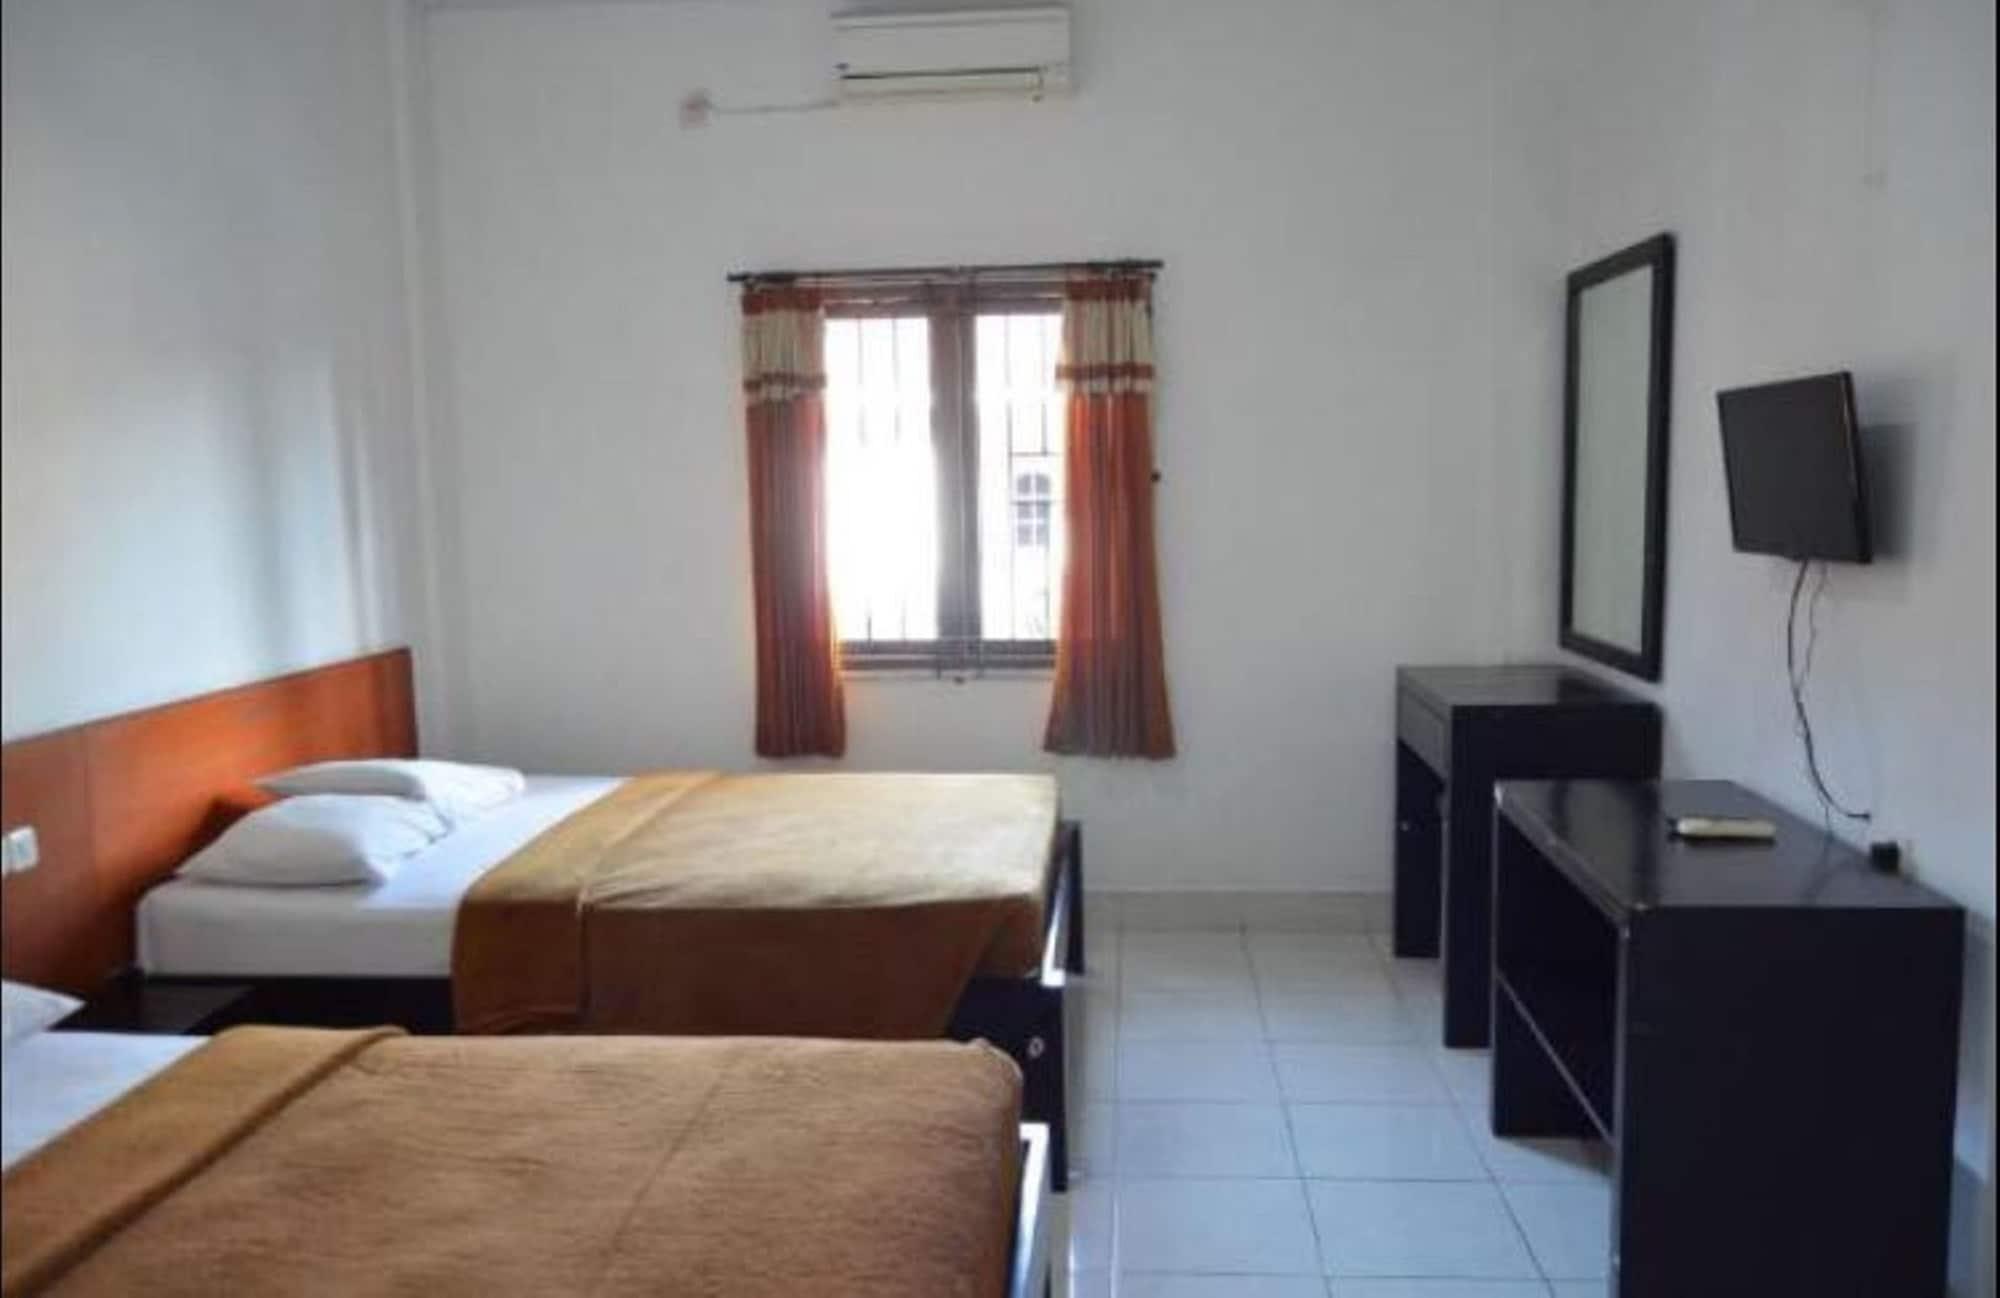 Hotel Nuansa Indah, Denpasar